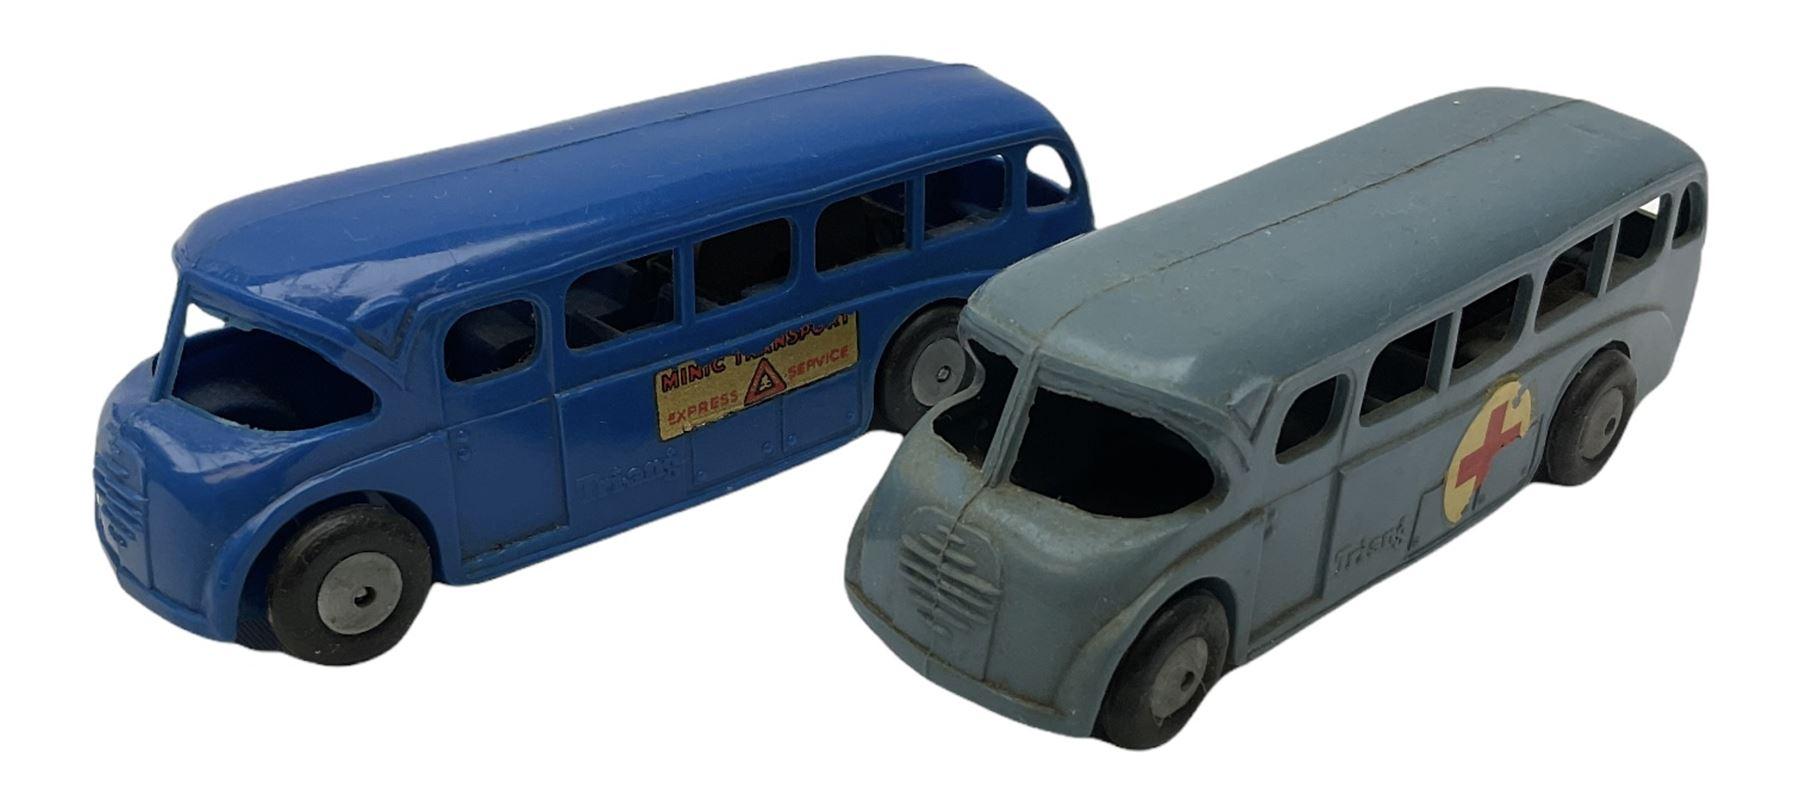 Tri-ang/Tri-ang Minic - twelve plastic friction-drive vehicles comprising Tri-ang Toys/Pedigree Pram - Image 6 of 7